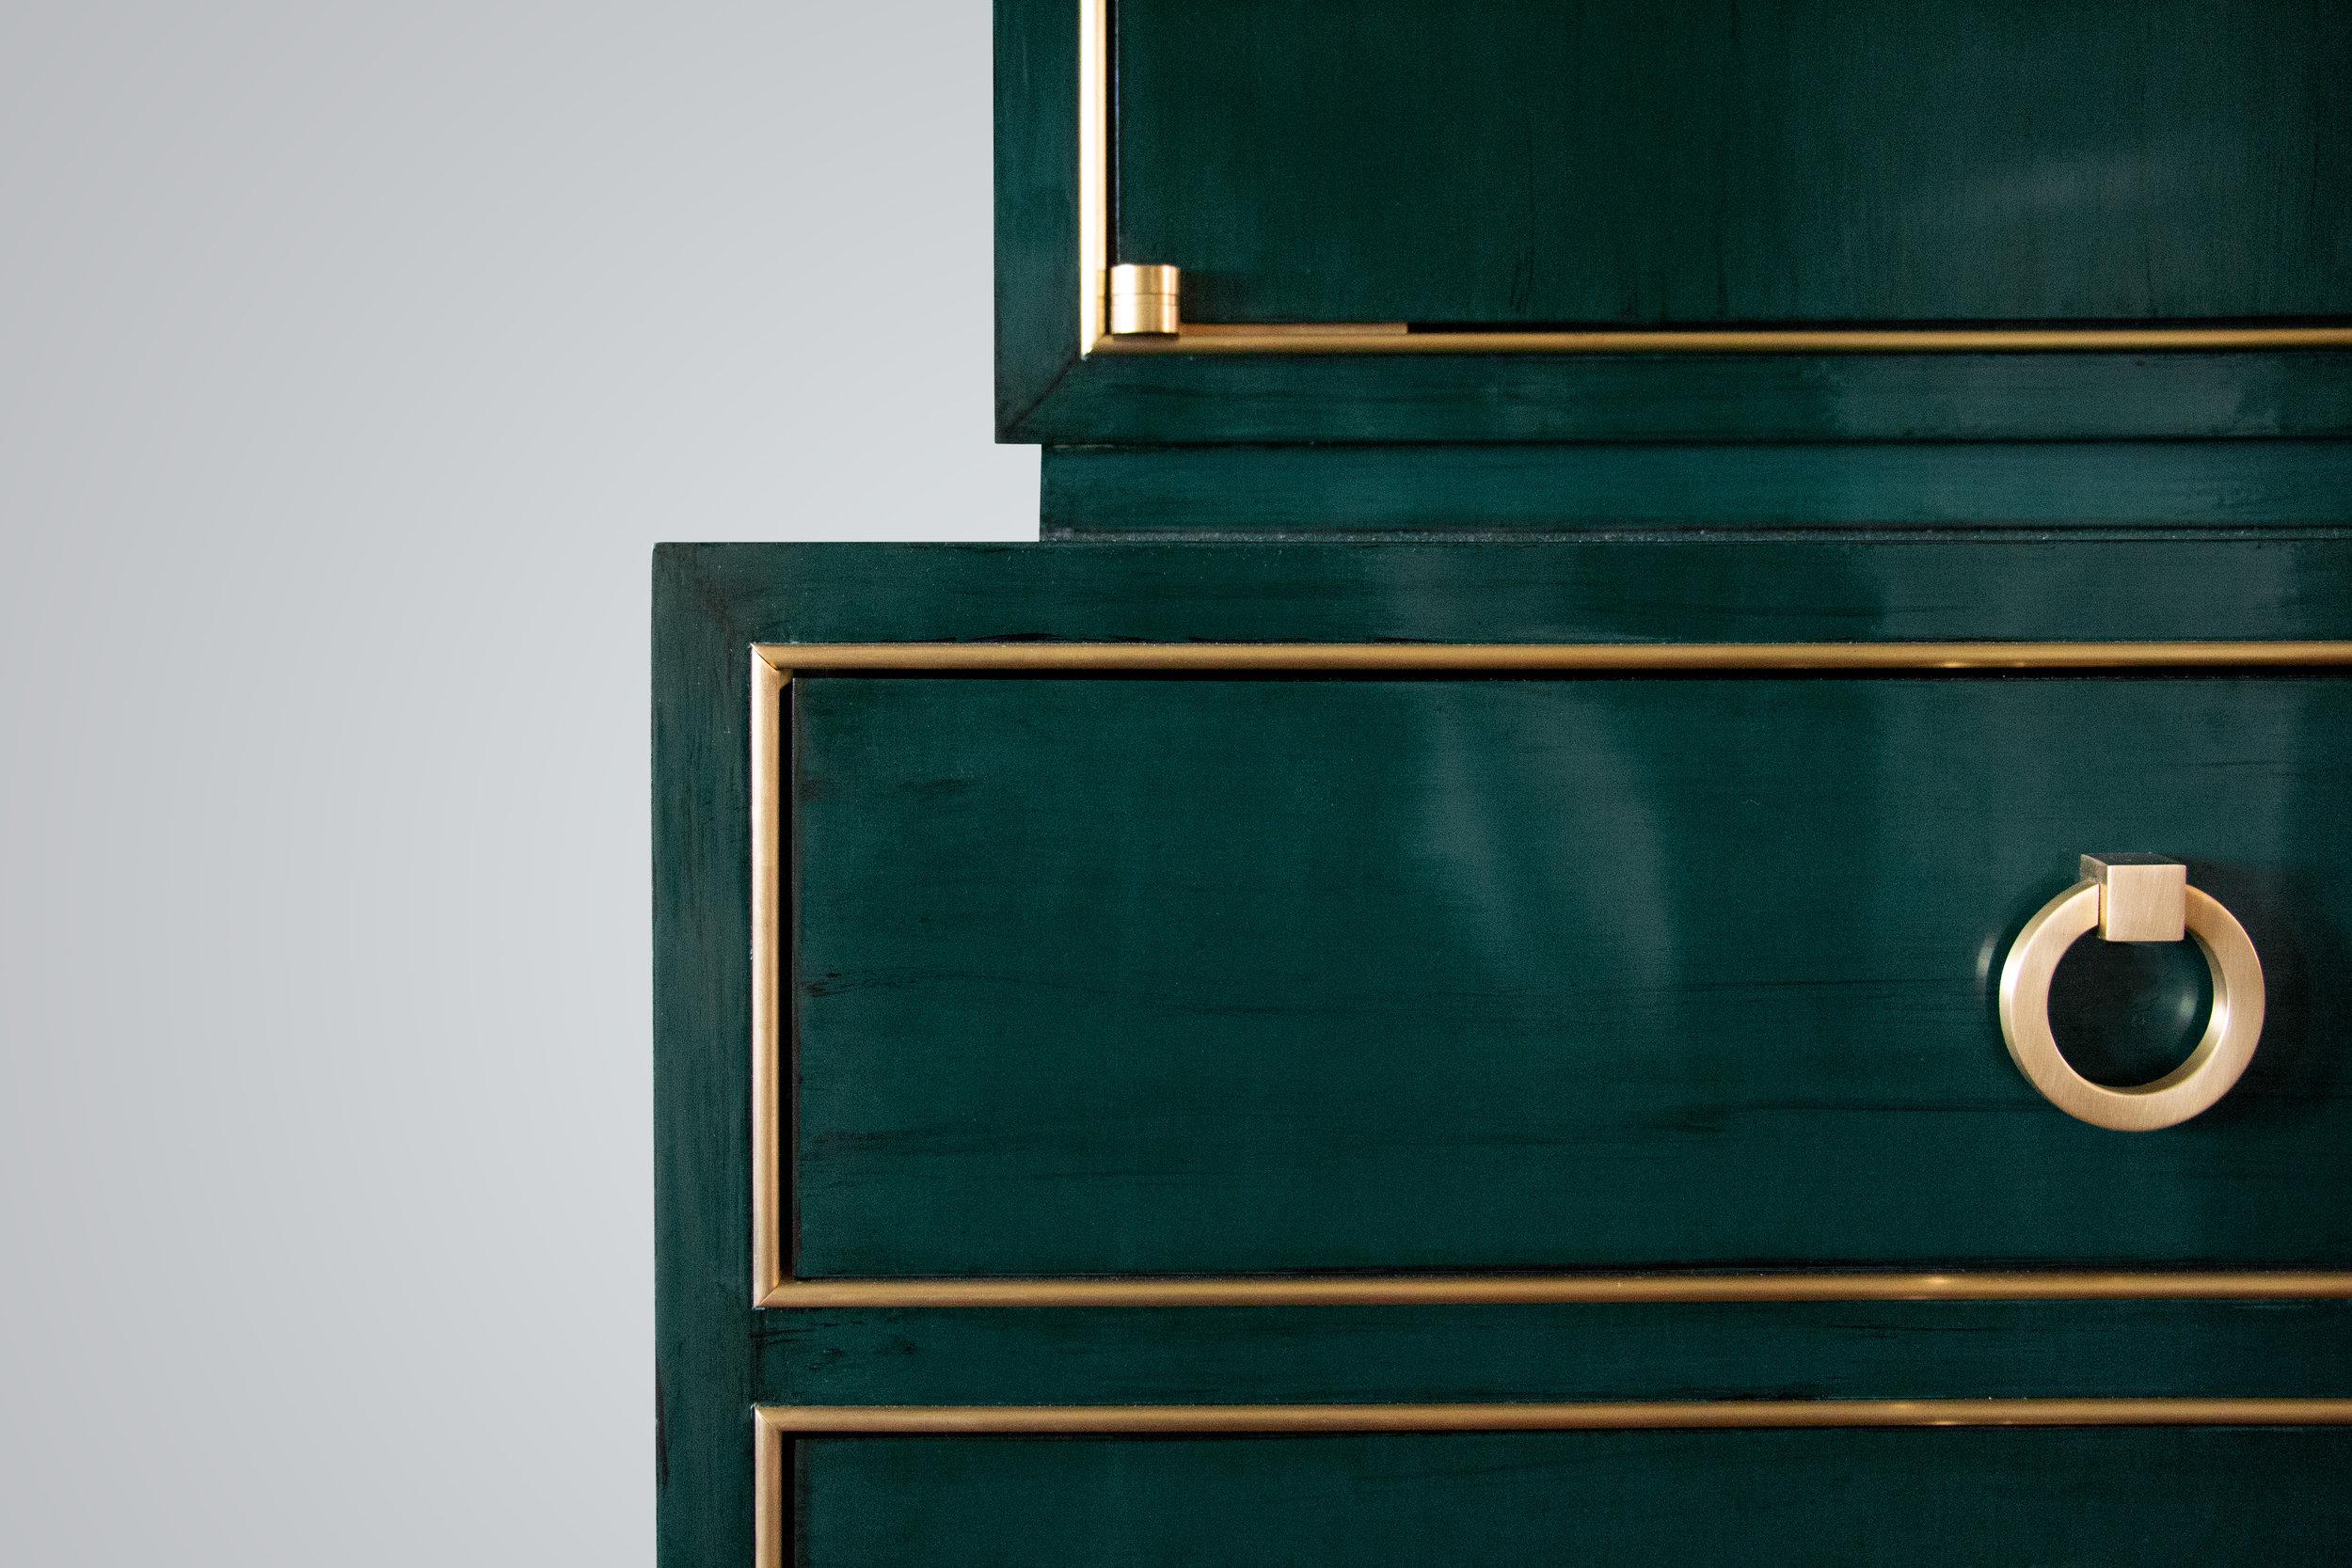 Green-Chest-Front-Detail.jpg